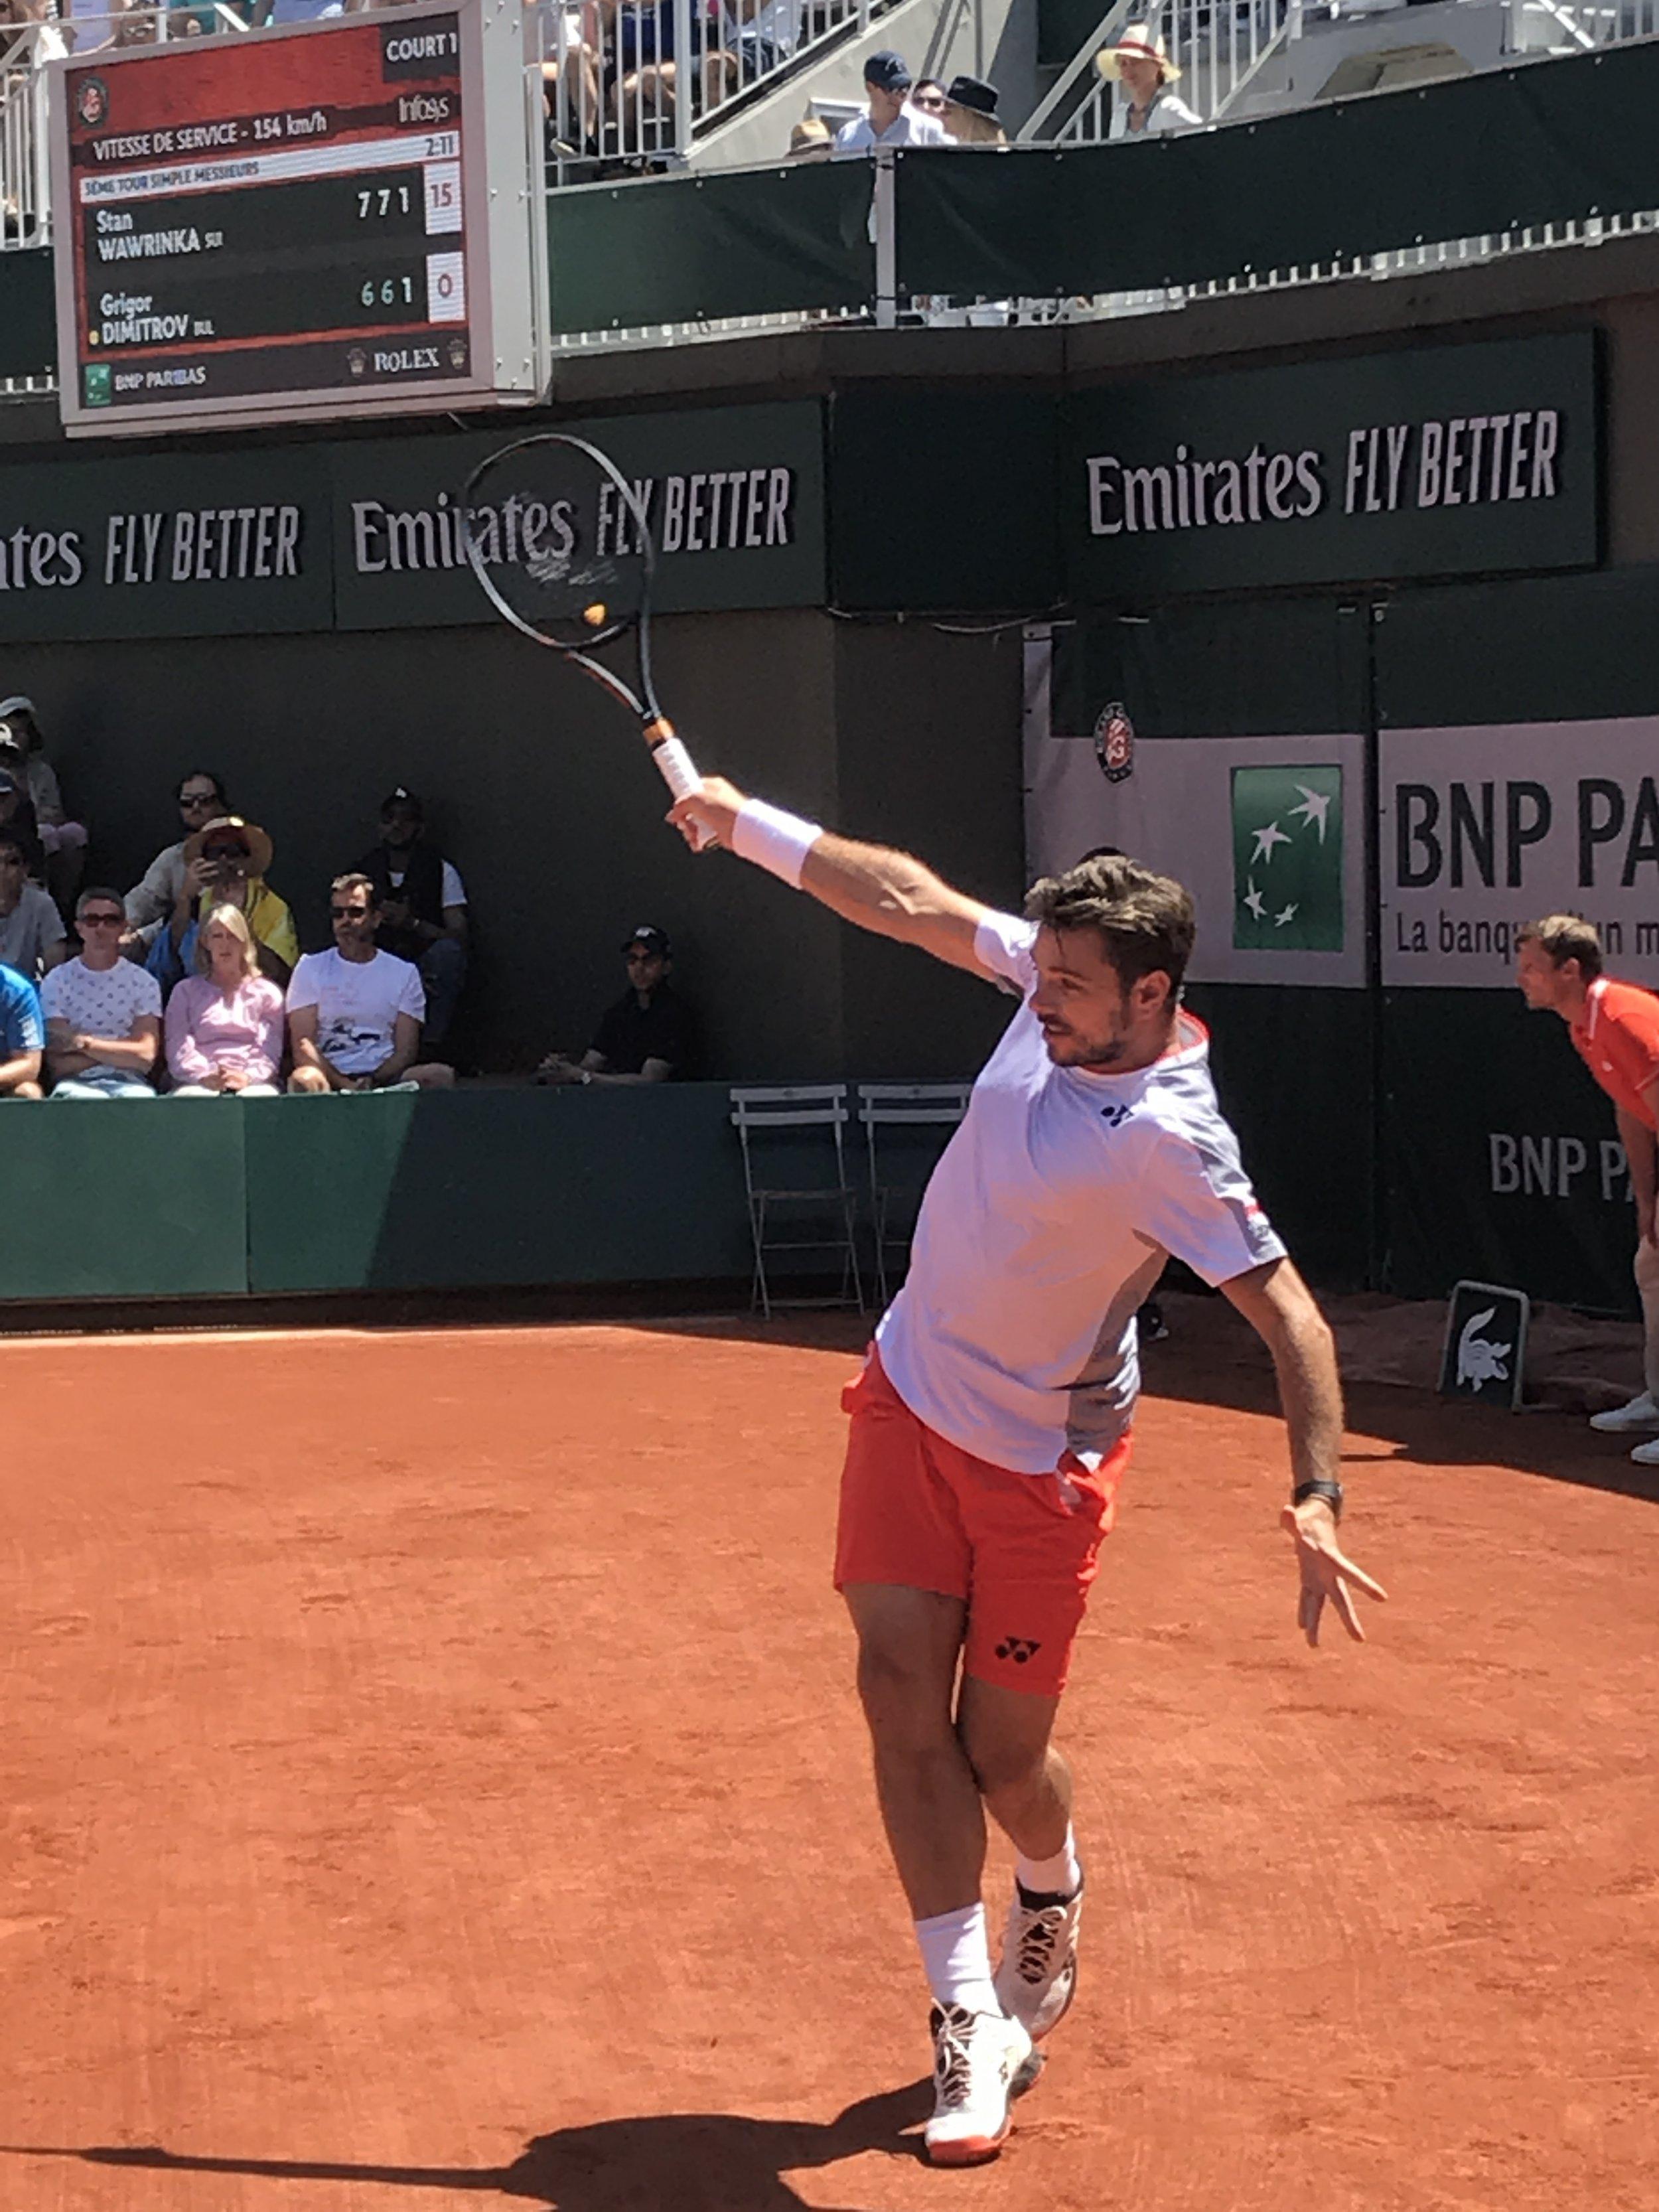 Wawrinka auf Court No. 1